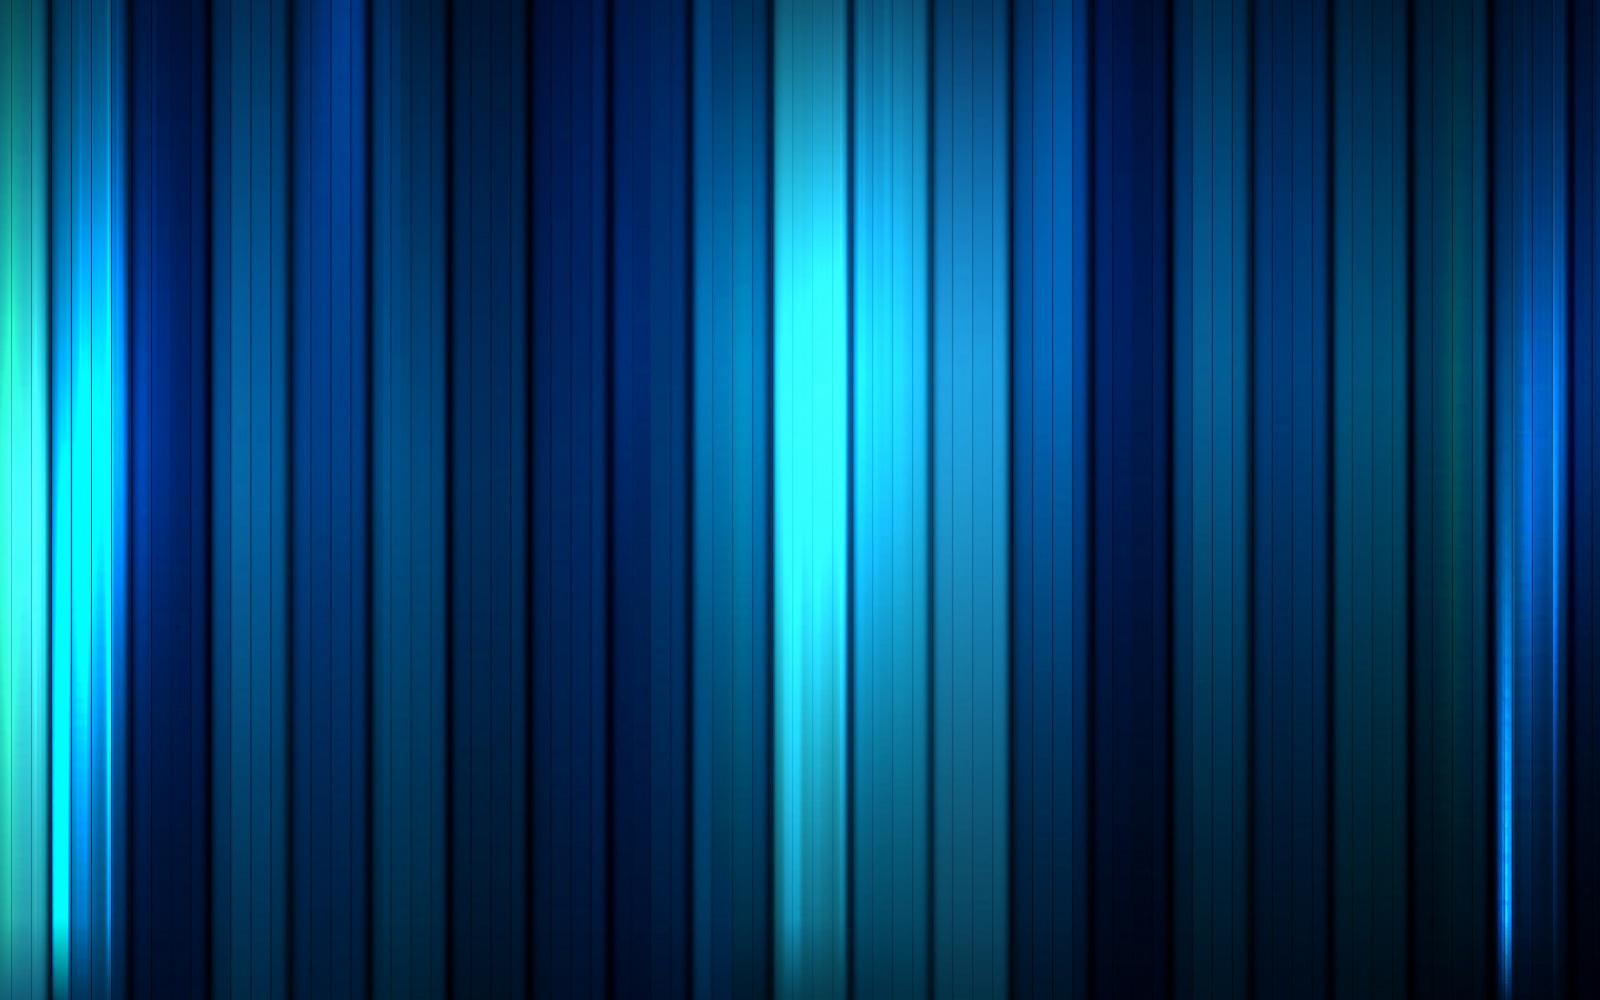 The Best Top Desktop Blue Wallpapers Blue Wallpaper Blue Background Hd 33 Virtualised Reality